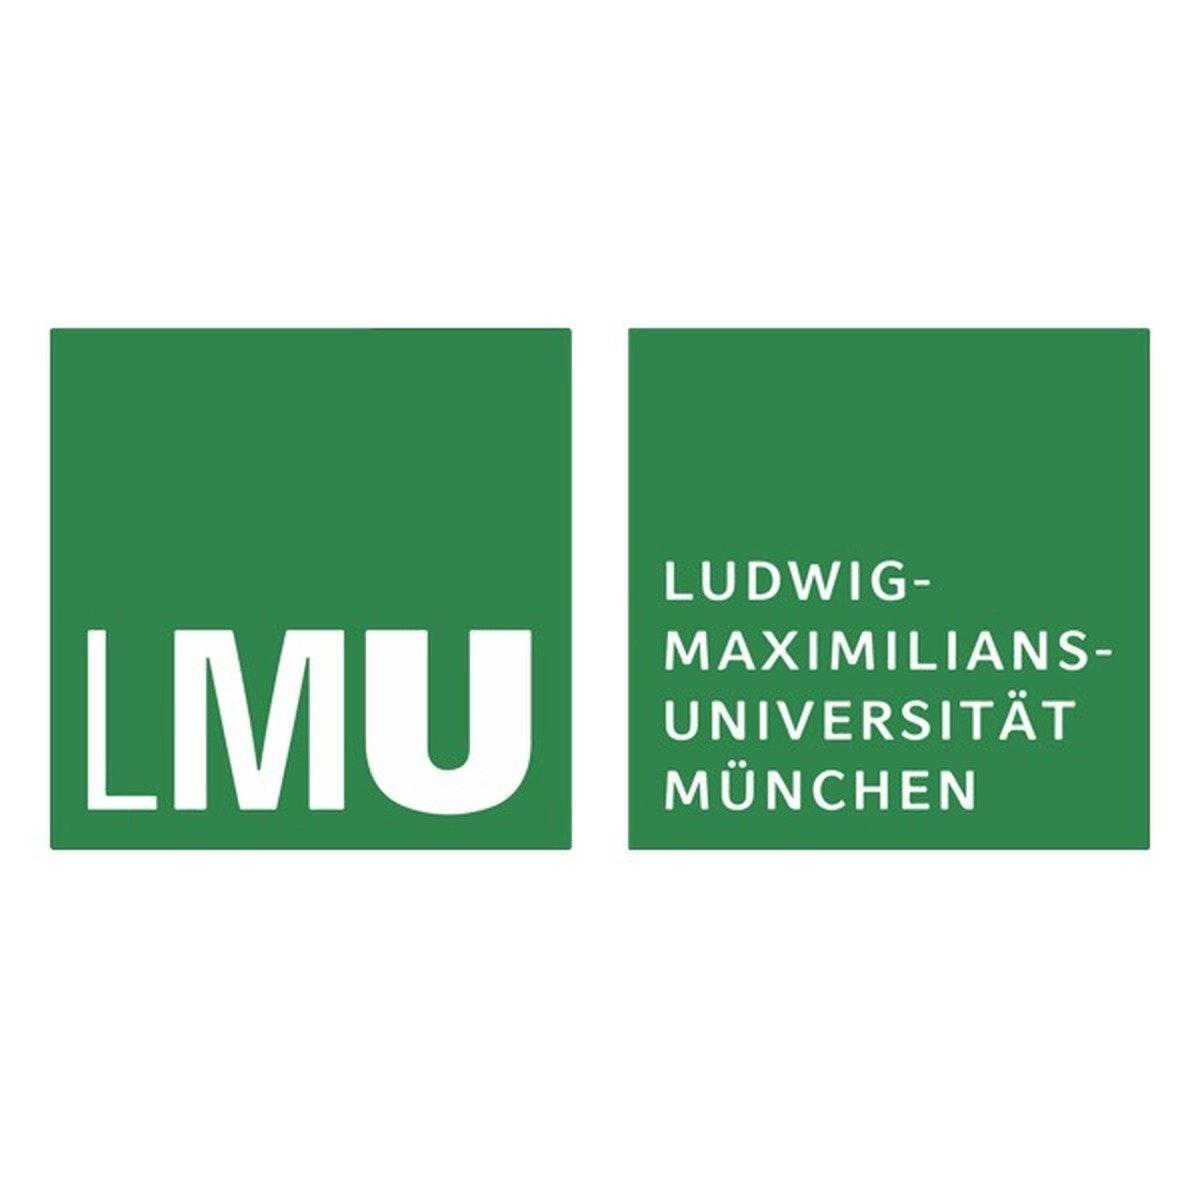 Ludwig-Maximilians-Universität, Zentrale Universitätsverwaltung